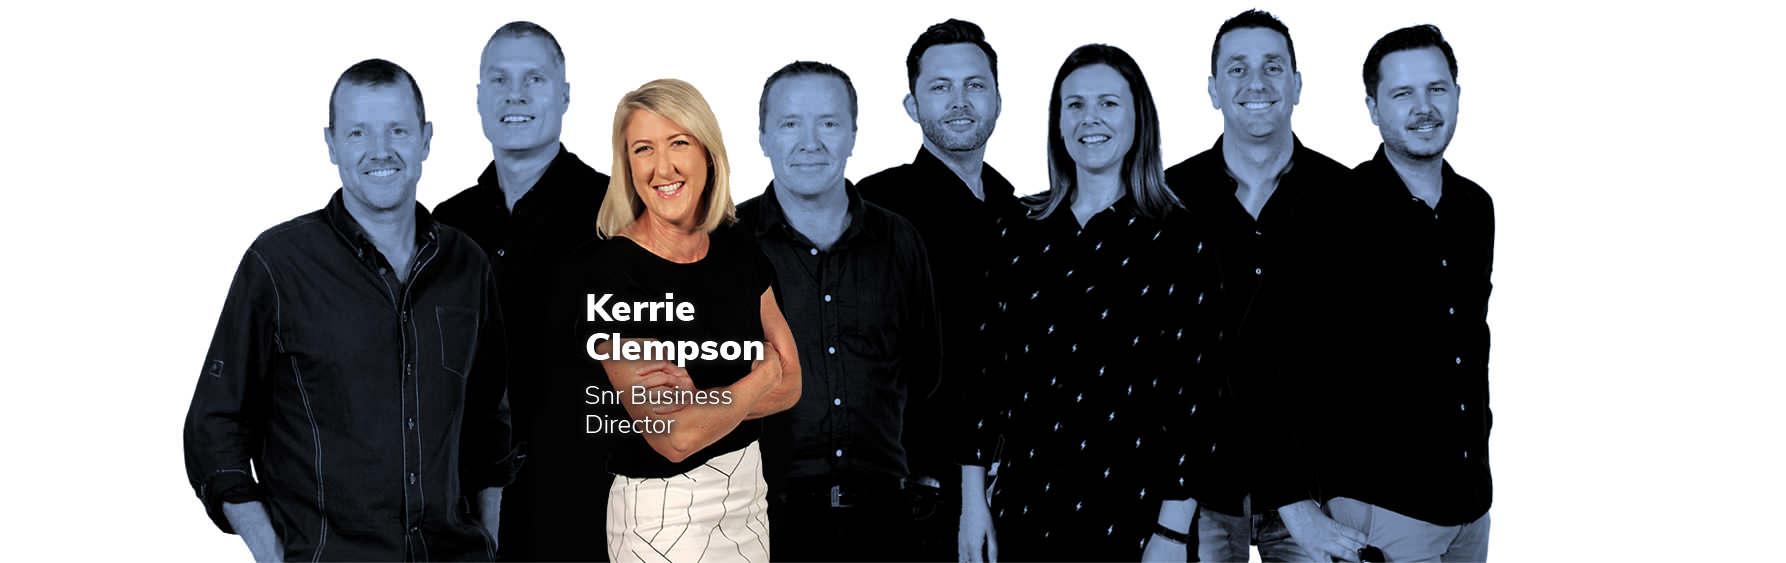 Kerrie Clempson - Senior Account Director